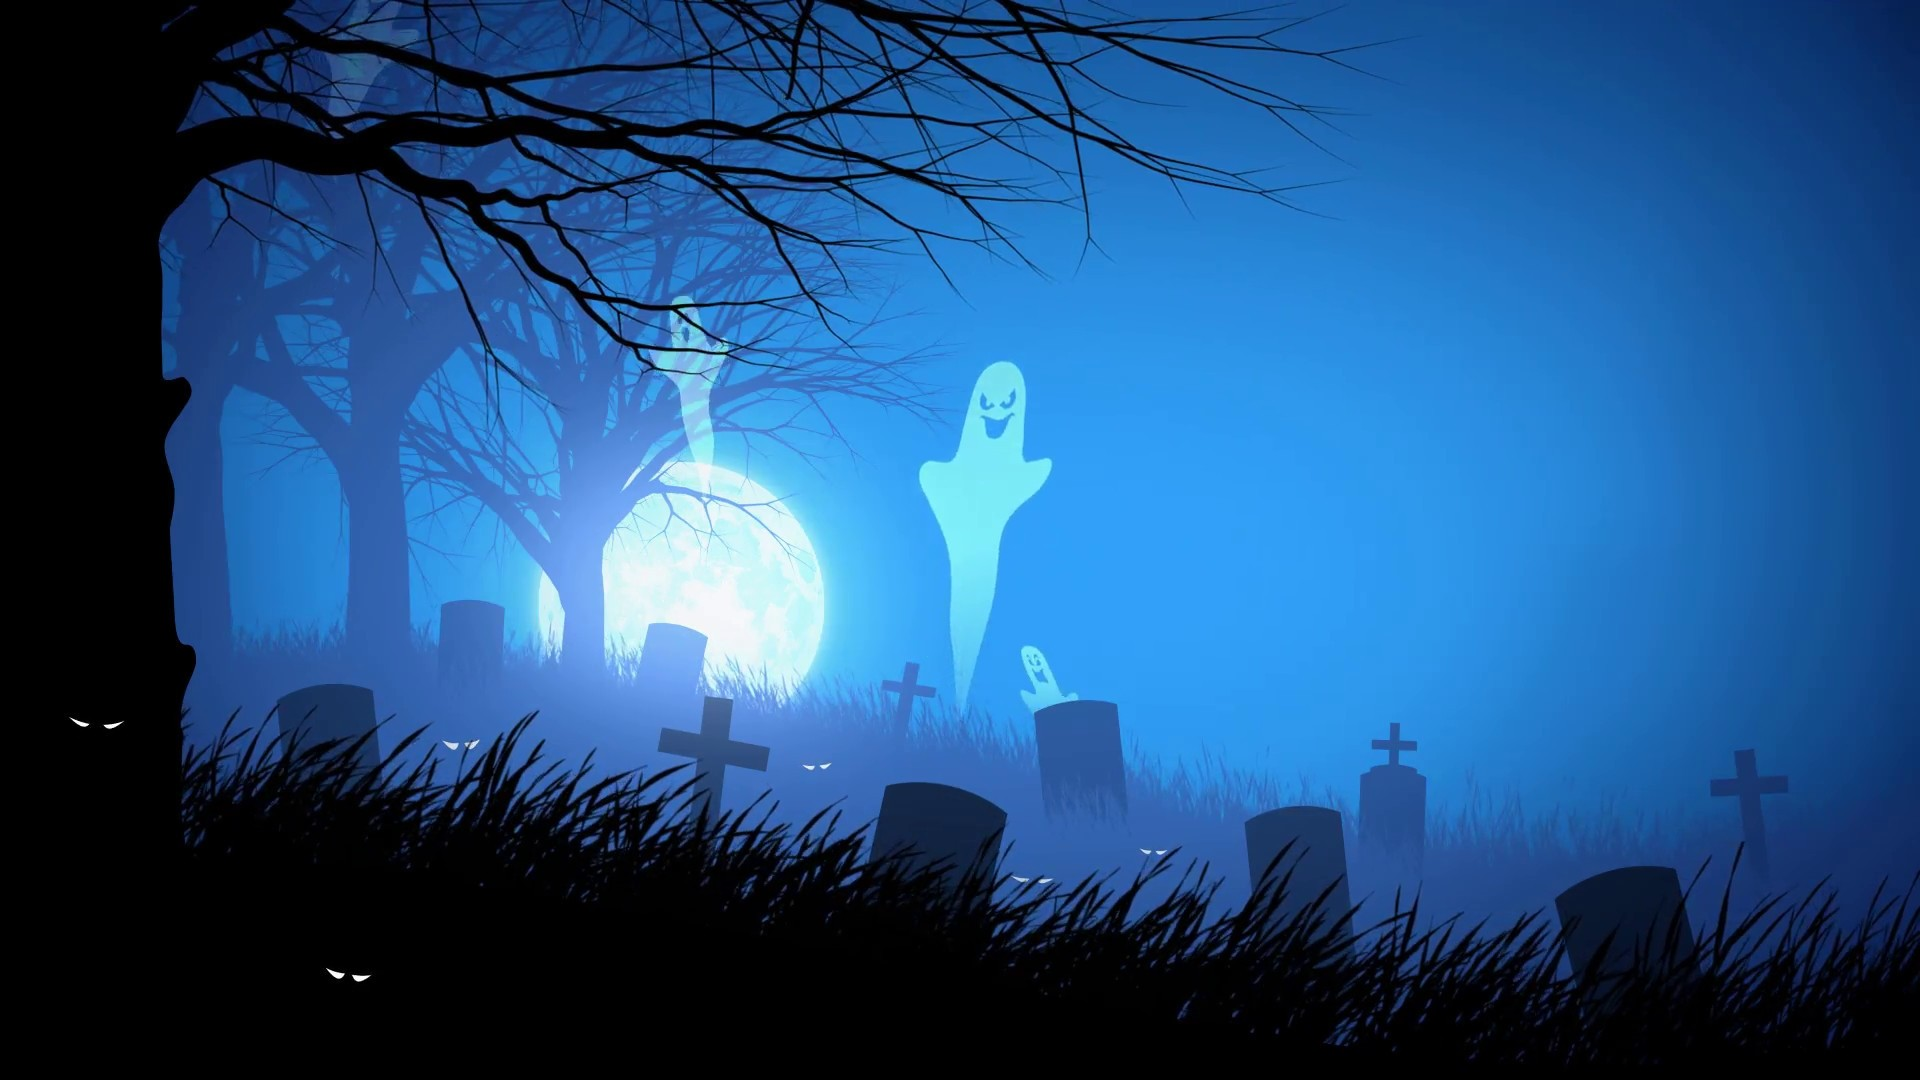 Spooky Vector Download Wallpaper